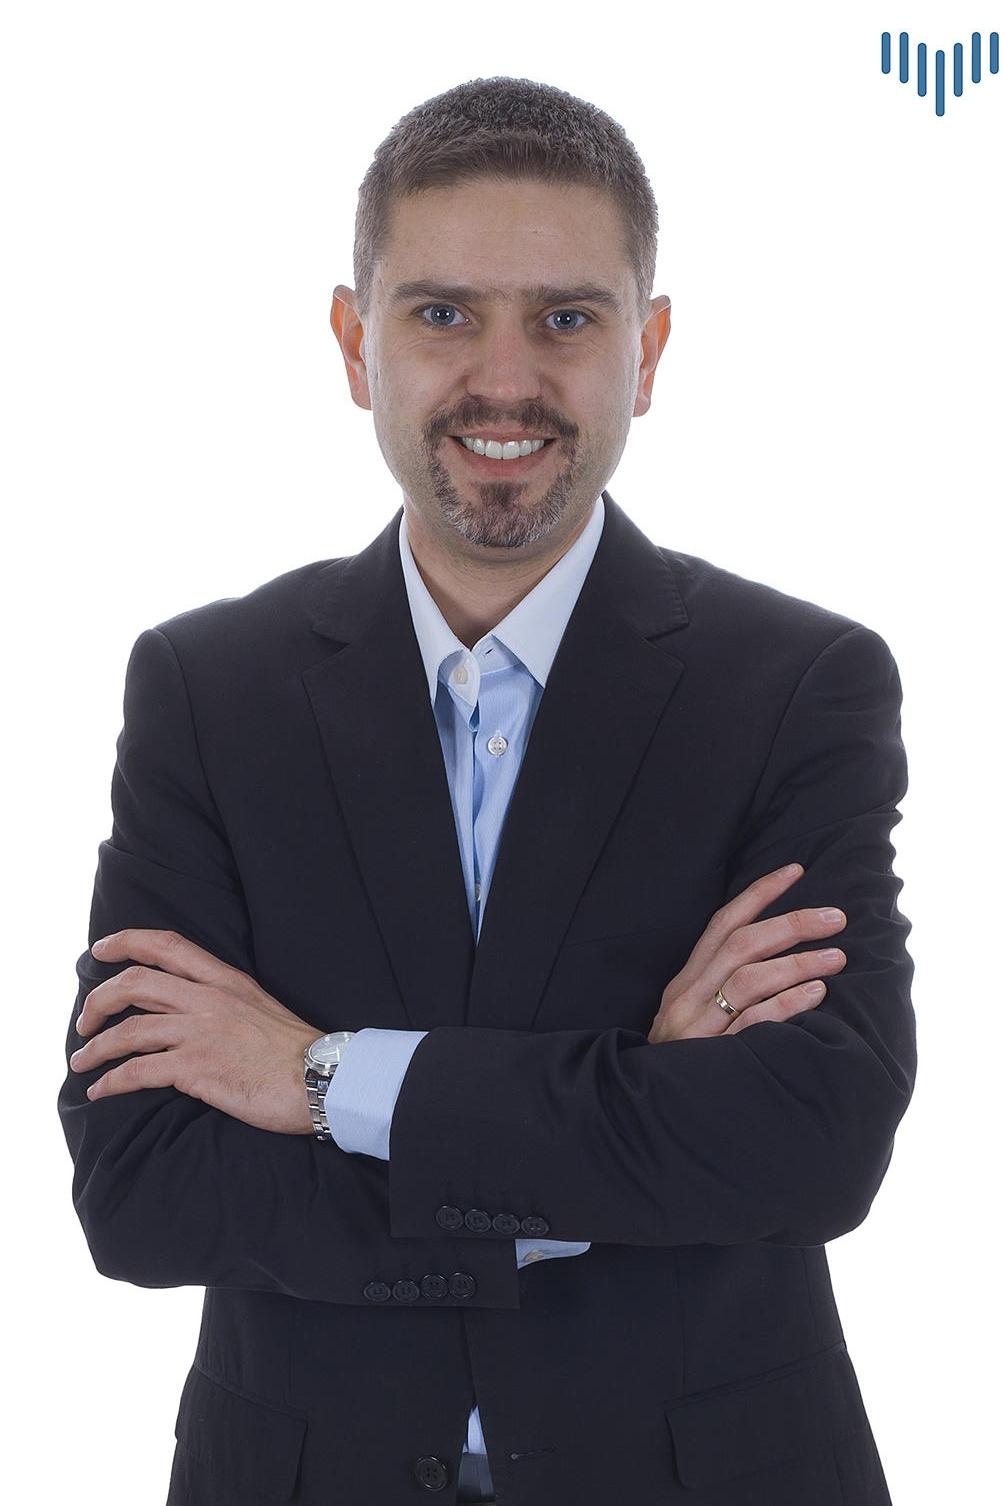 Kamil Kipiel, Co-Founder of Medical Simulation Technologies